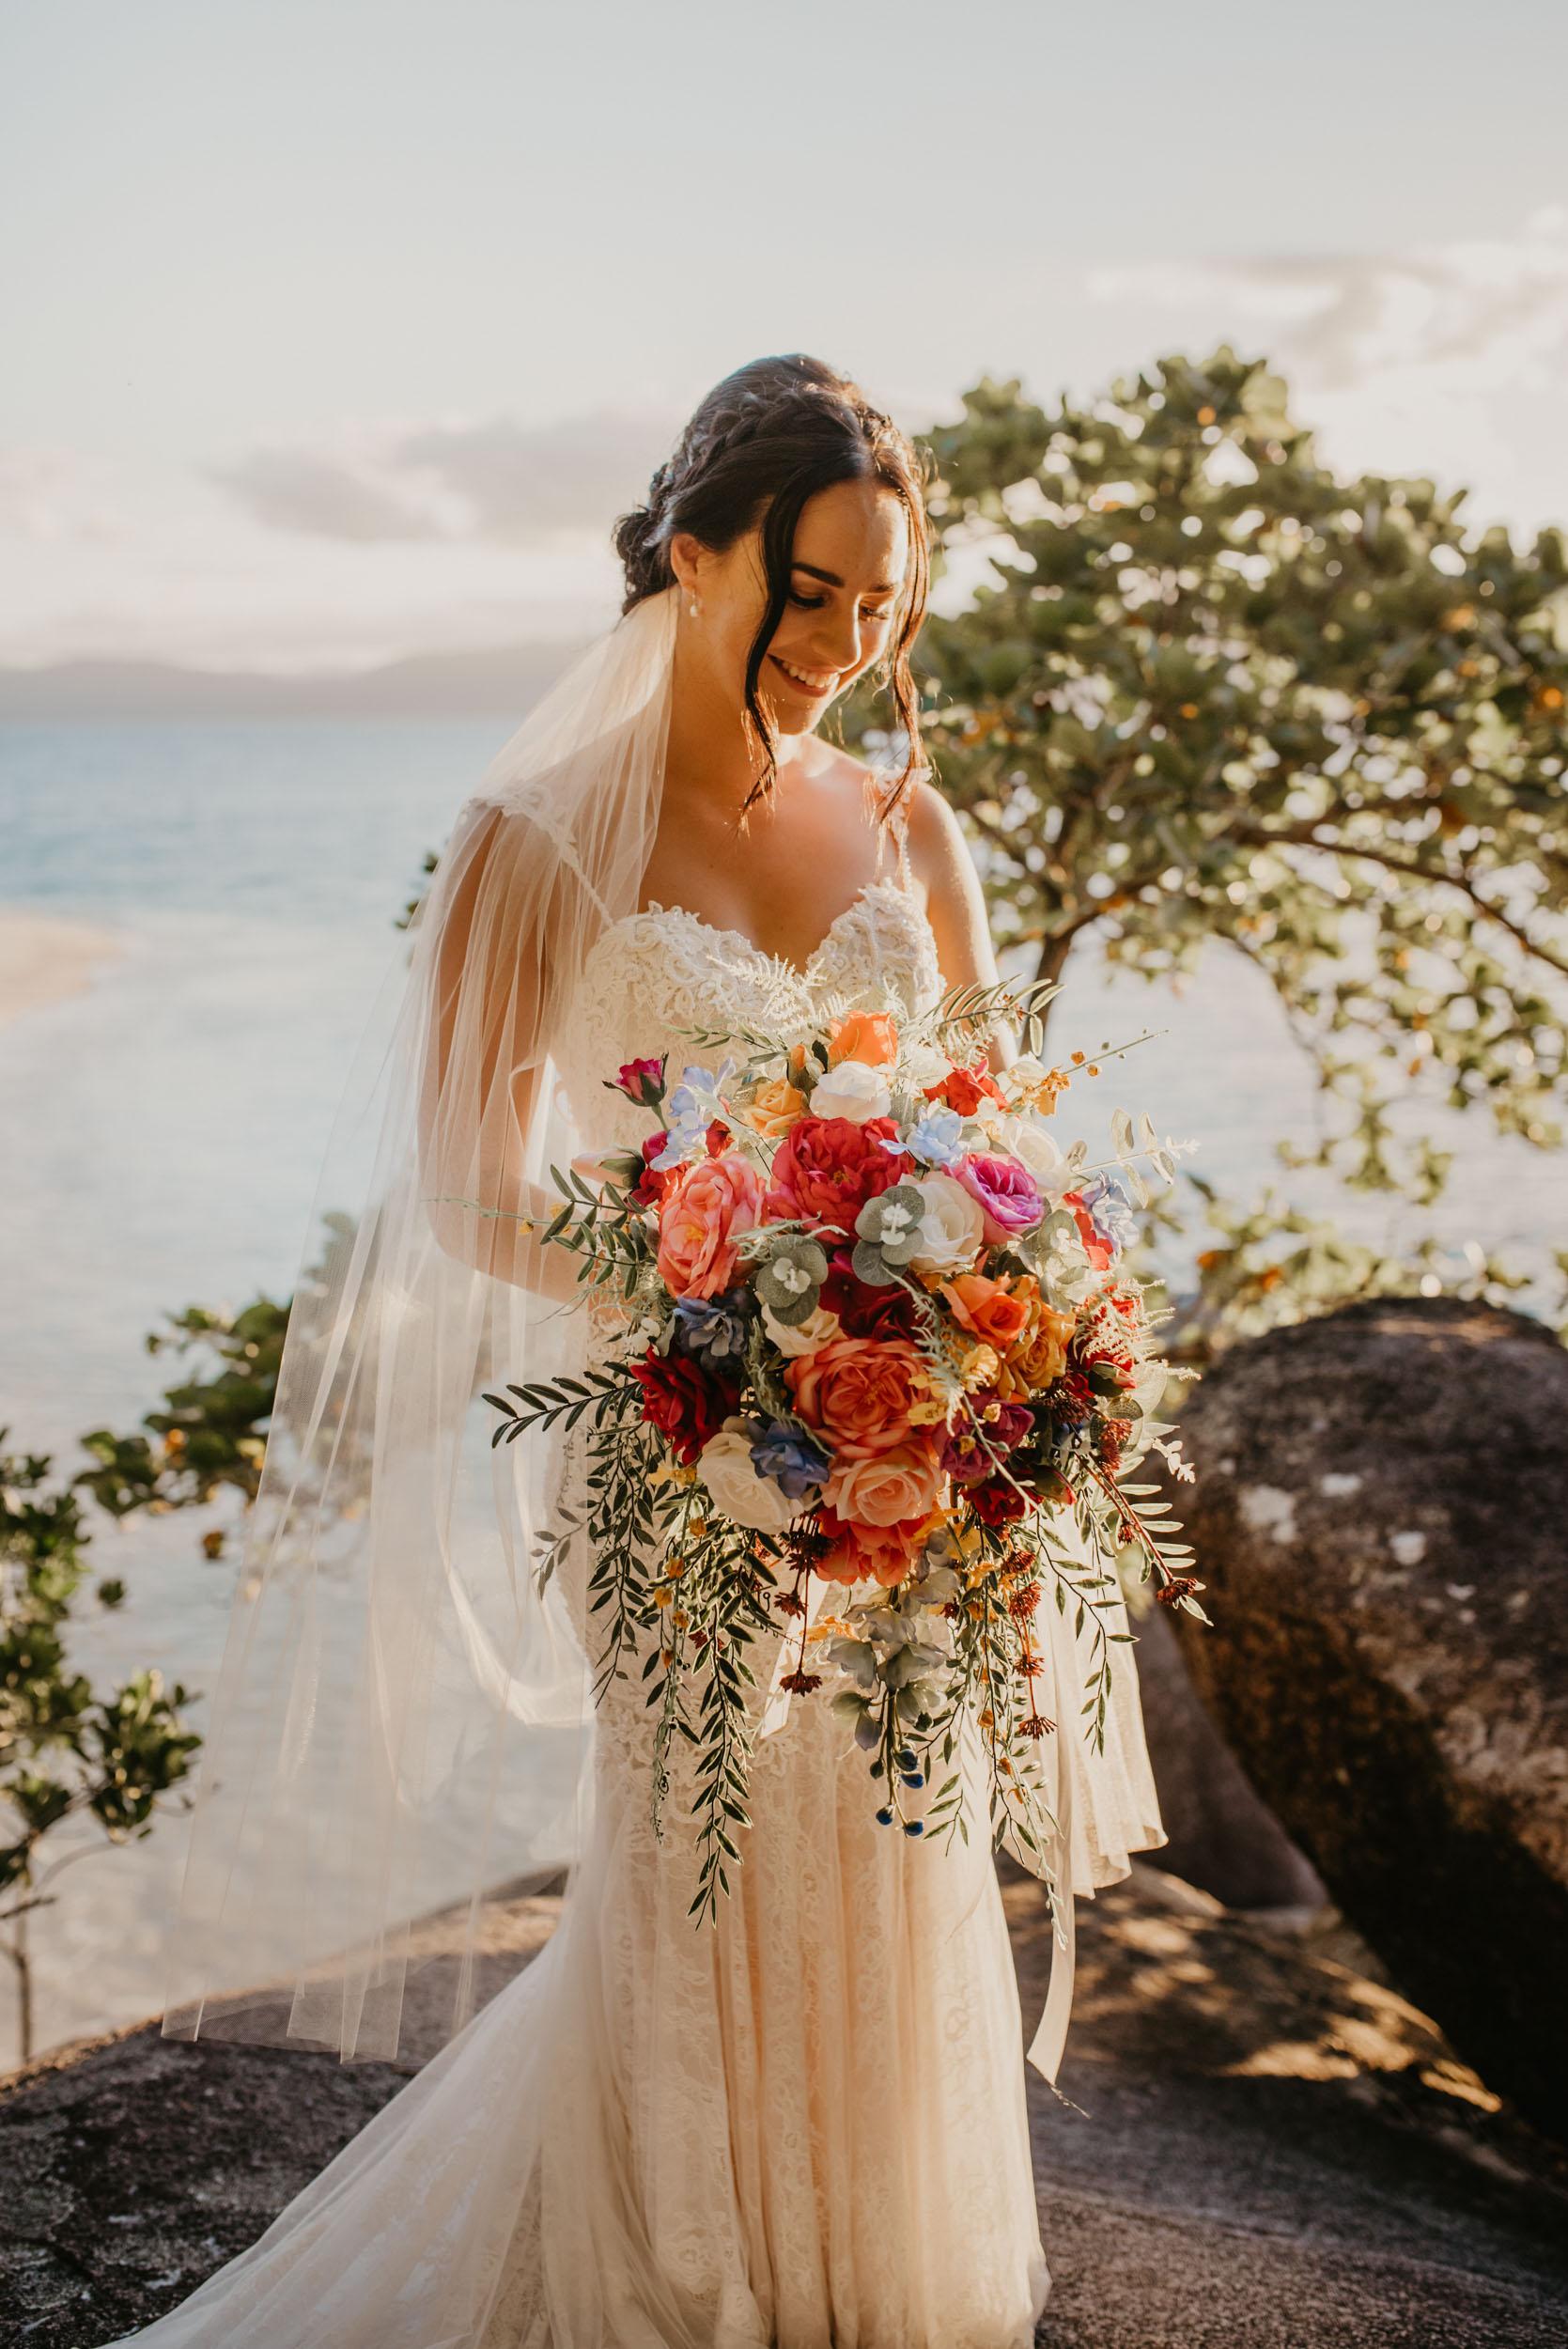 The Raw Photographer - Cairns and Port Douglas Wedding Photographer - Best of 2018-67.jpg